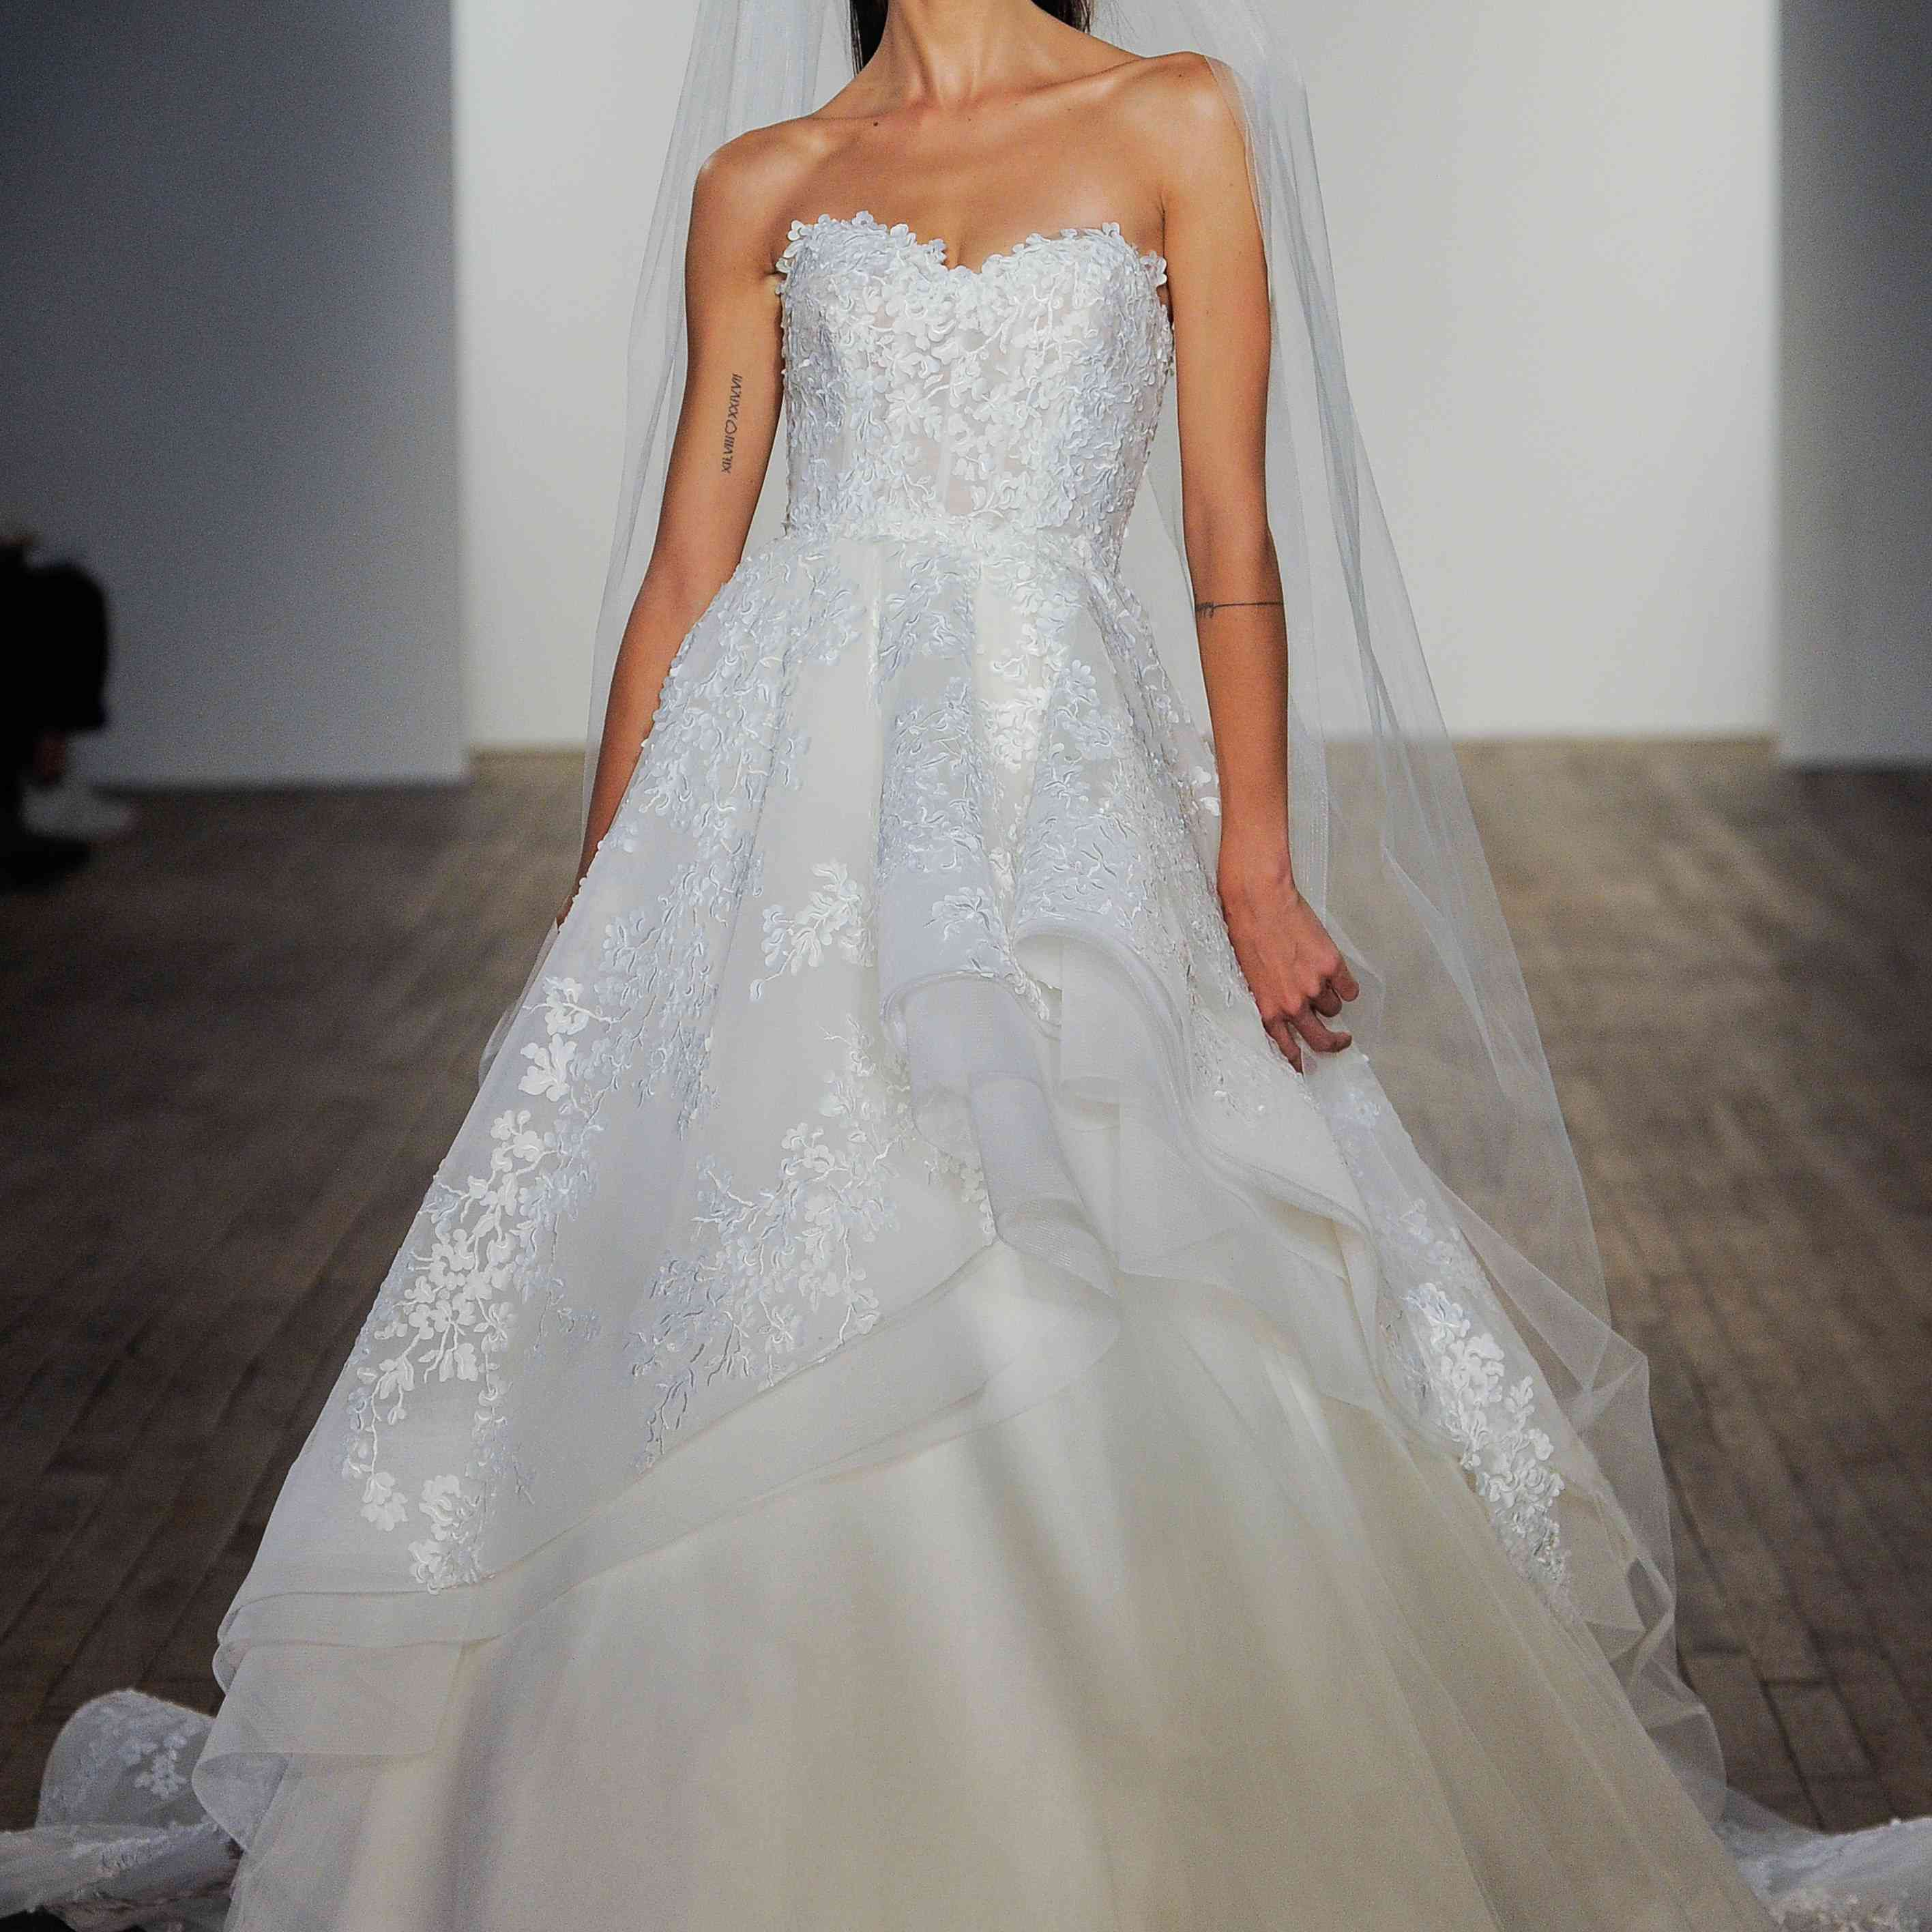 Estee strapless wedding ball gown